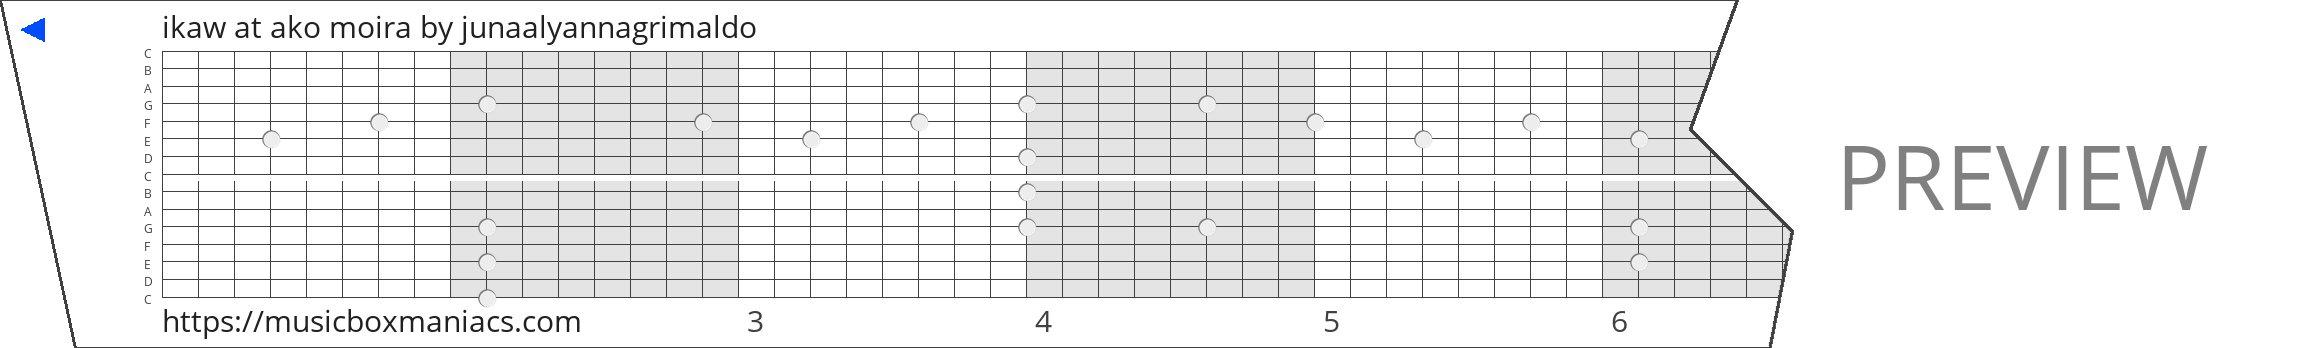 ikaw at ako moira 15 note music box paper strip